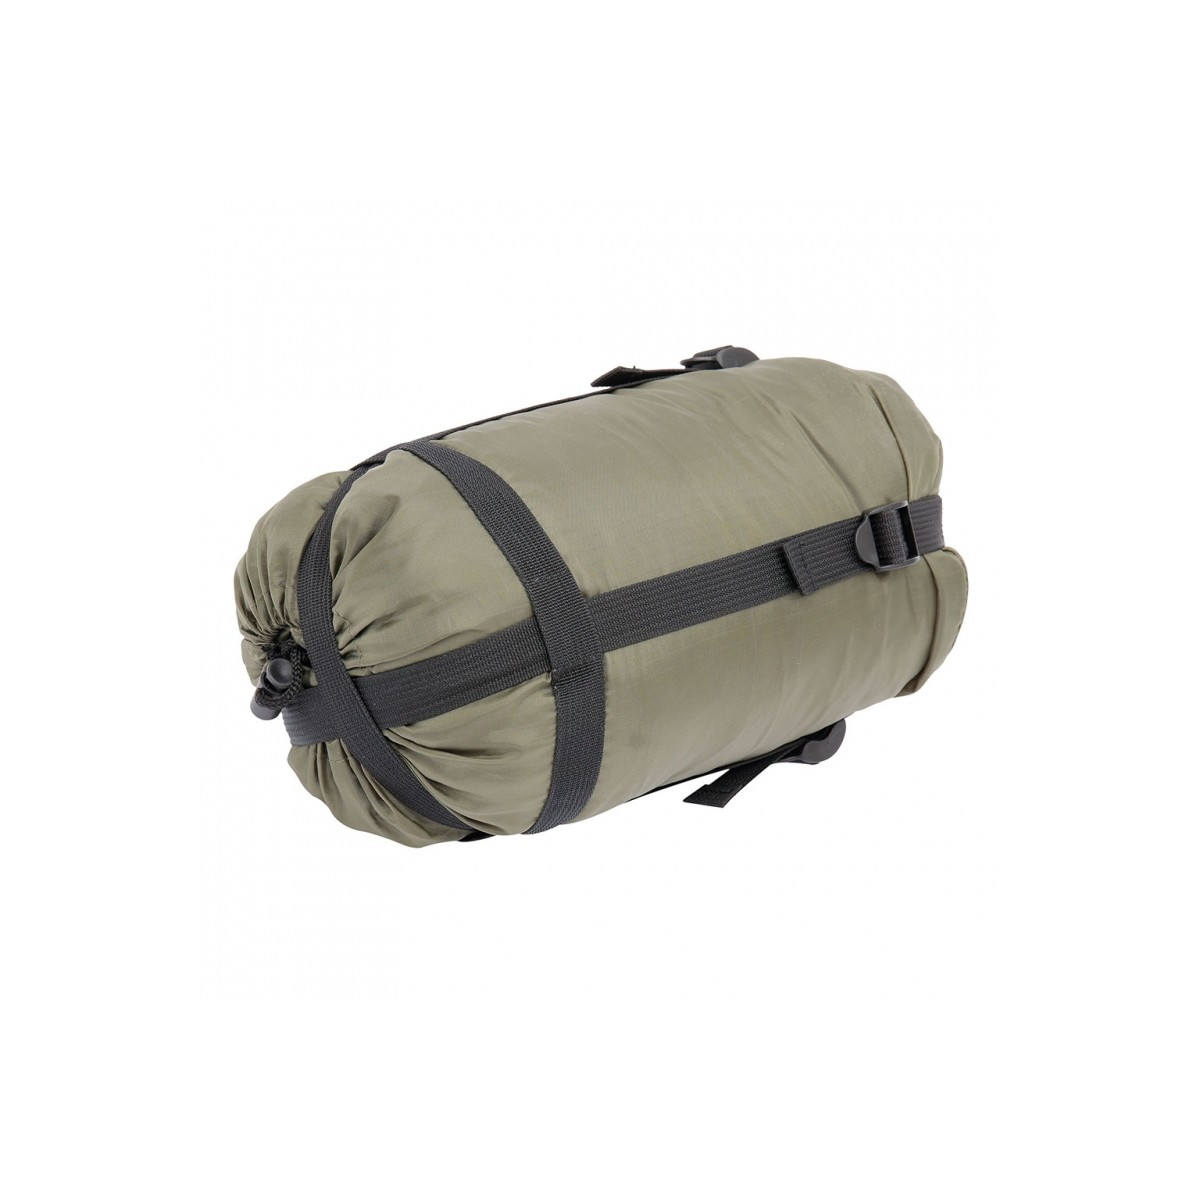 sac de couchage ultra l ger compact x pro light bivouac. Black Bedroom Furniture Sets. Home Design Ideas